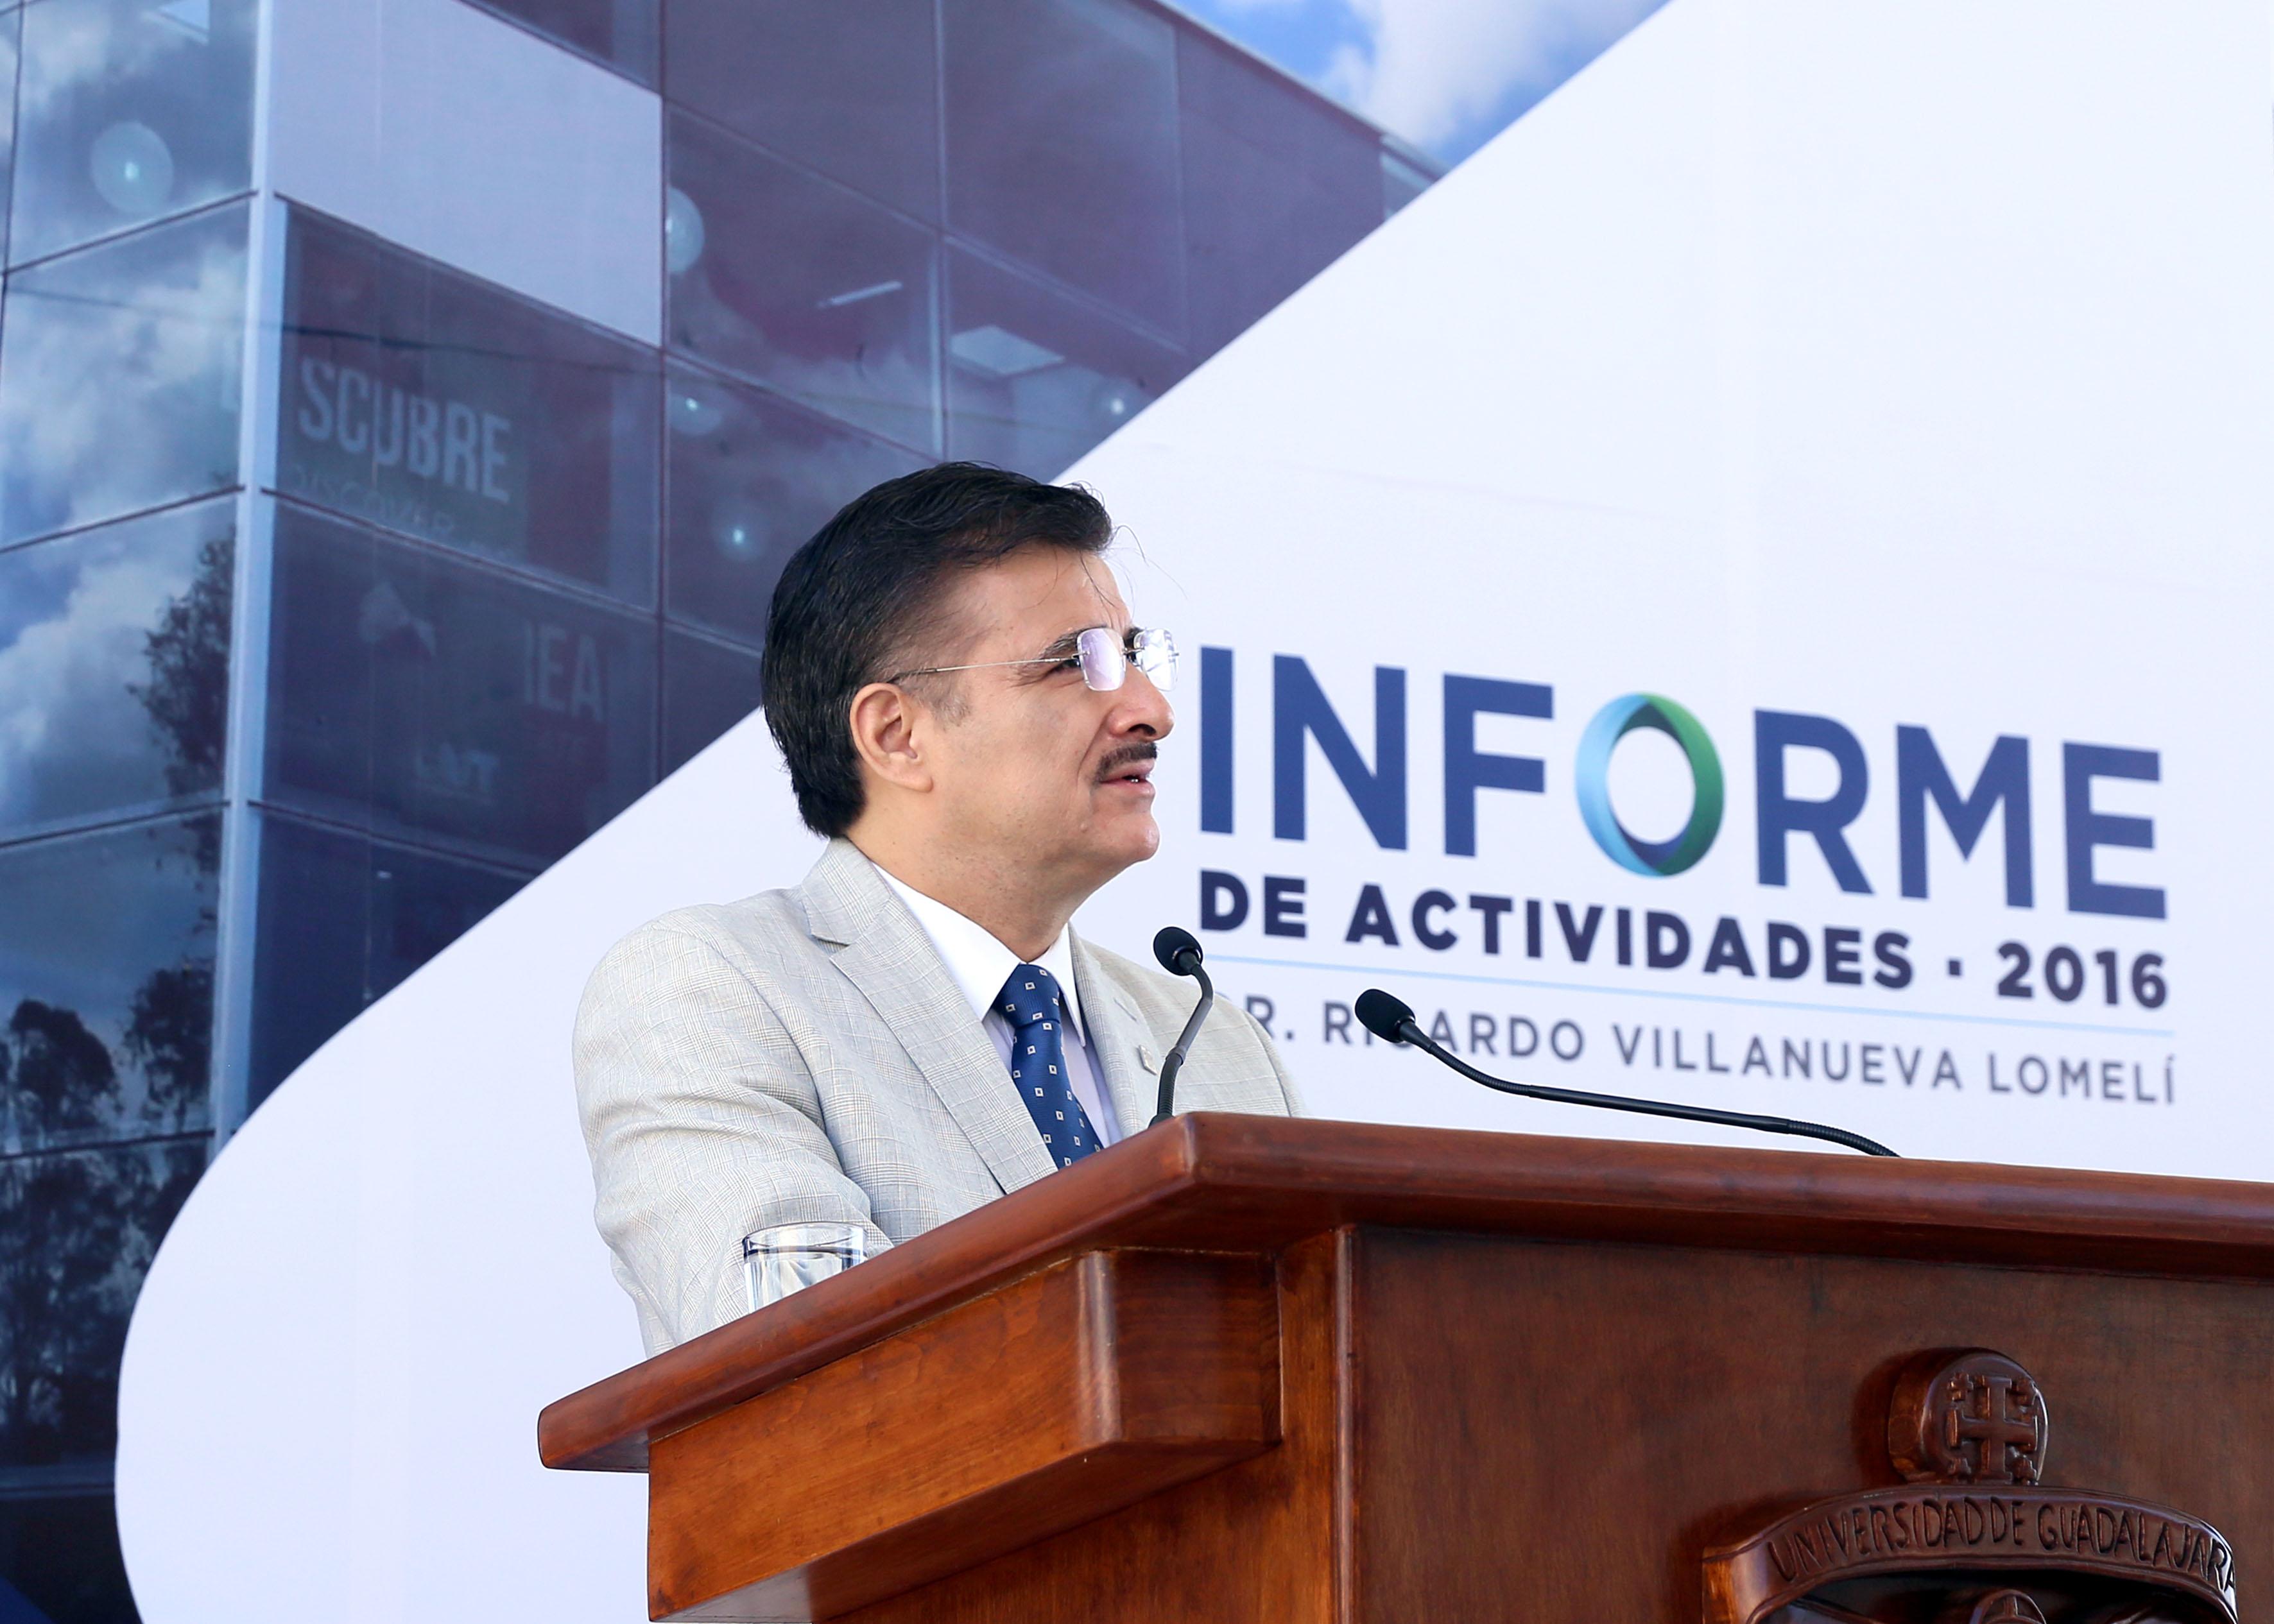 Rector General de la UdeG, maestro Itzcóatl Tonatiuh Bravo Padilla haceindo uso de la palabra